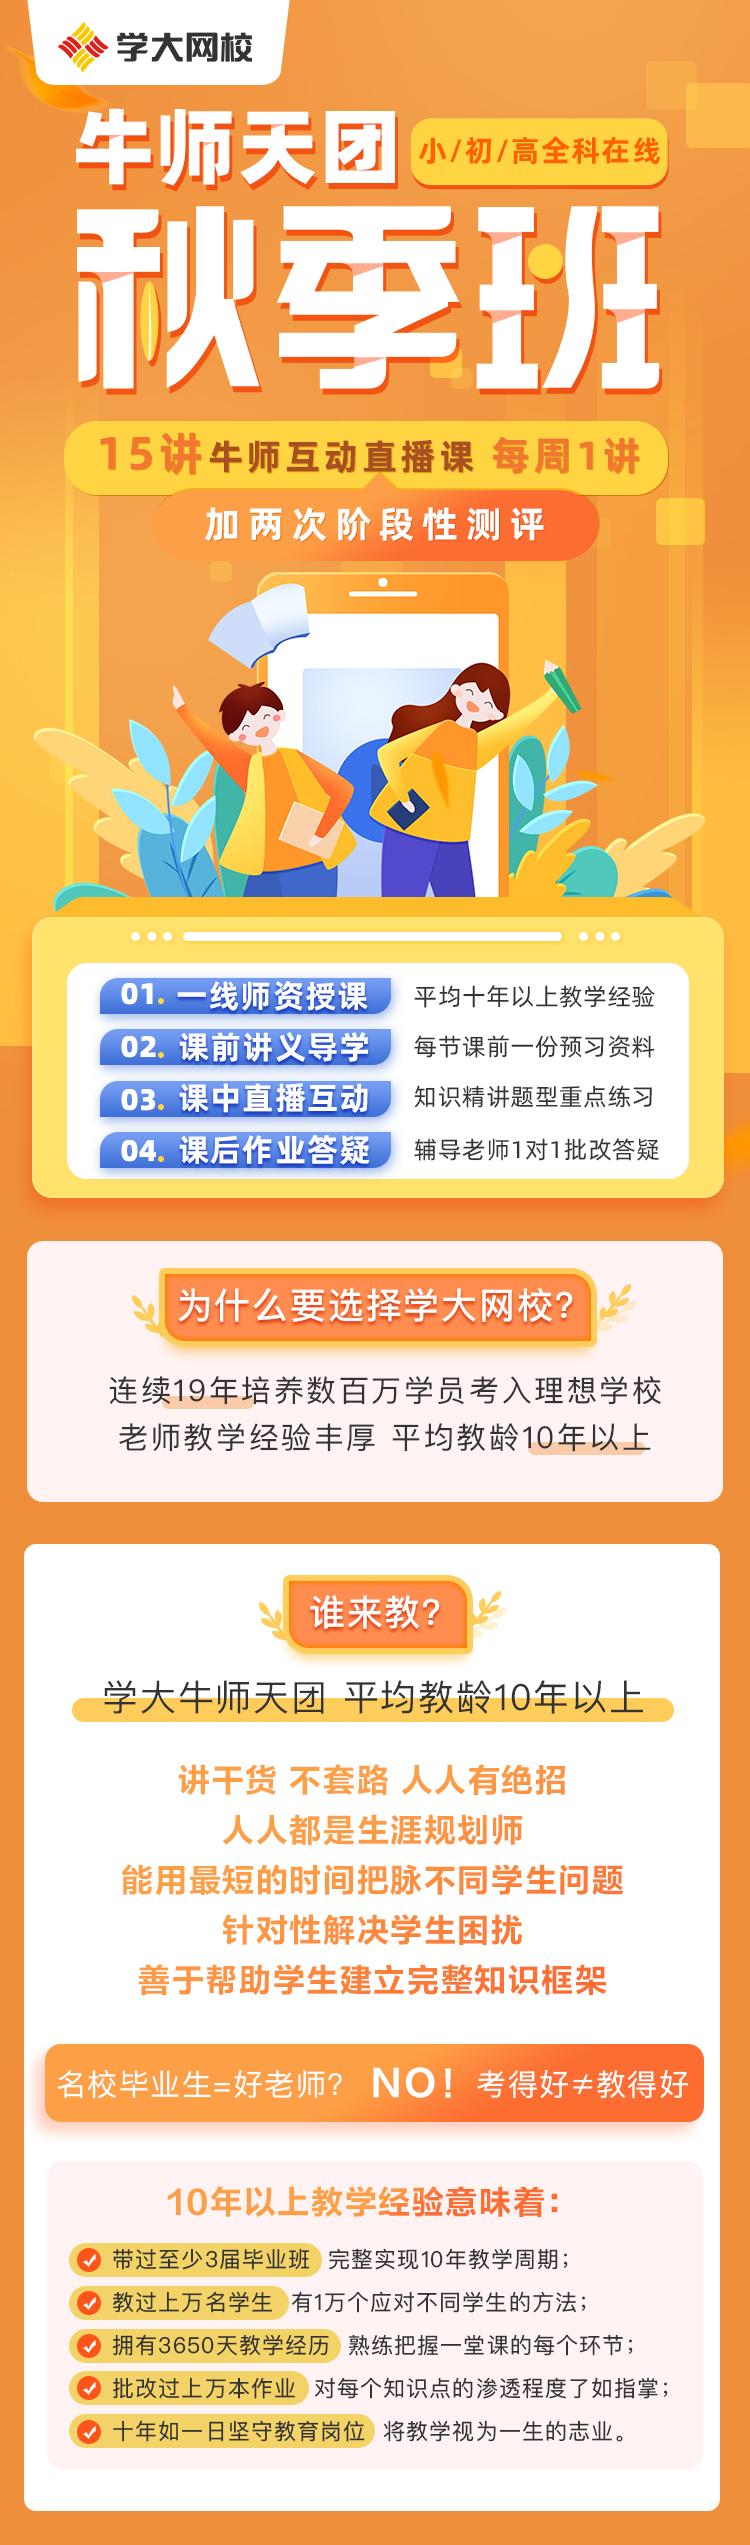 https://xdo-storage.oss-cn-beijing.aliyuncs.com/2020/08/07/tRPLZ6MFueiRu3YJoj7qlQ8ABjJxRqiIl7PcUHvM.jpeg